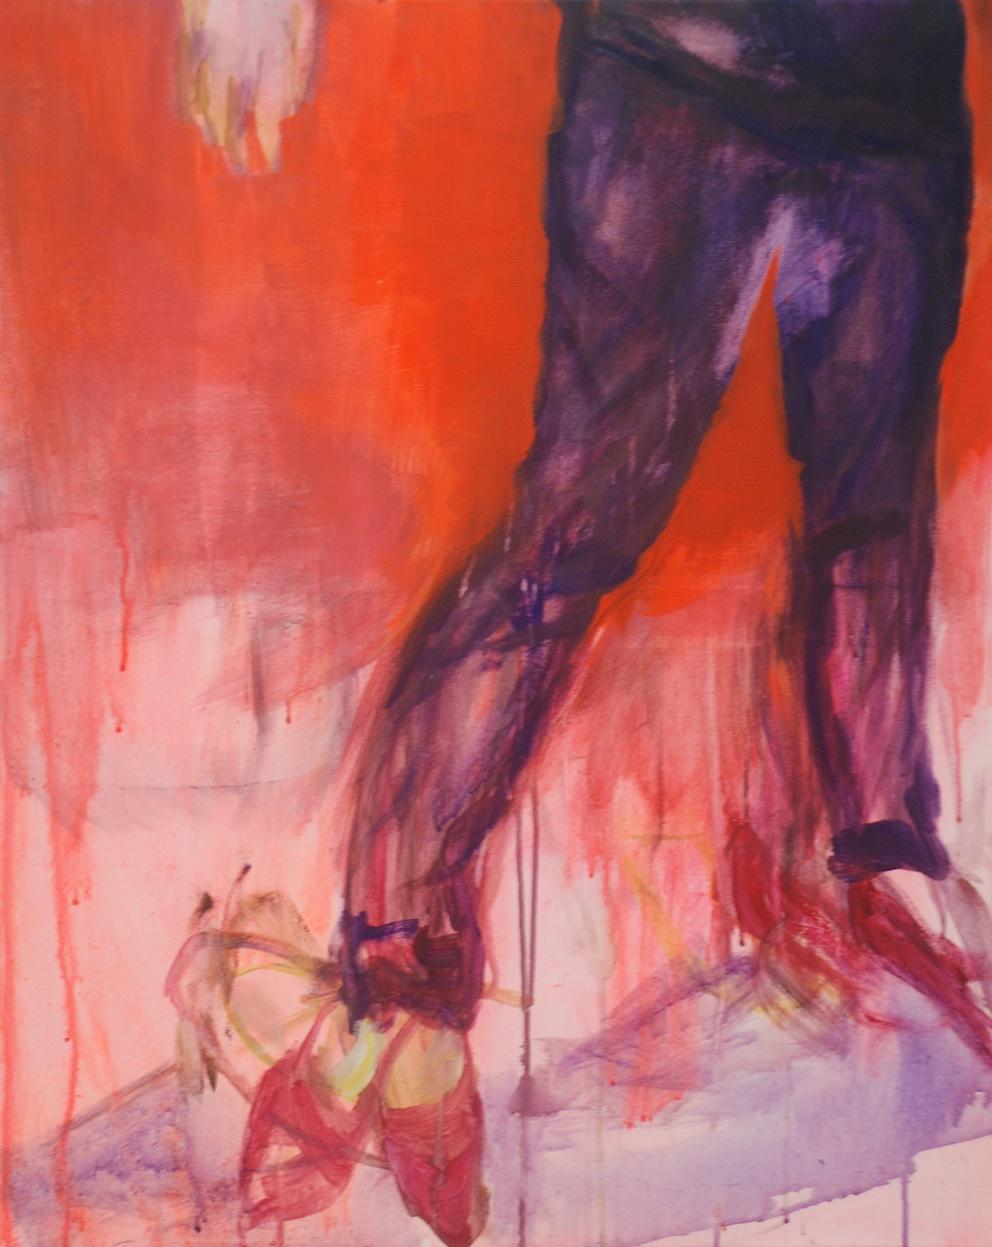 Elina Aho Raajat Limbs 2011 akryyli kankaalle 81 x 65 cm.jpg